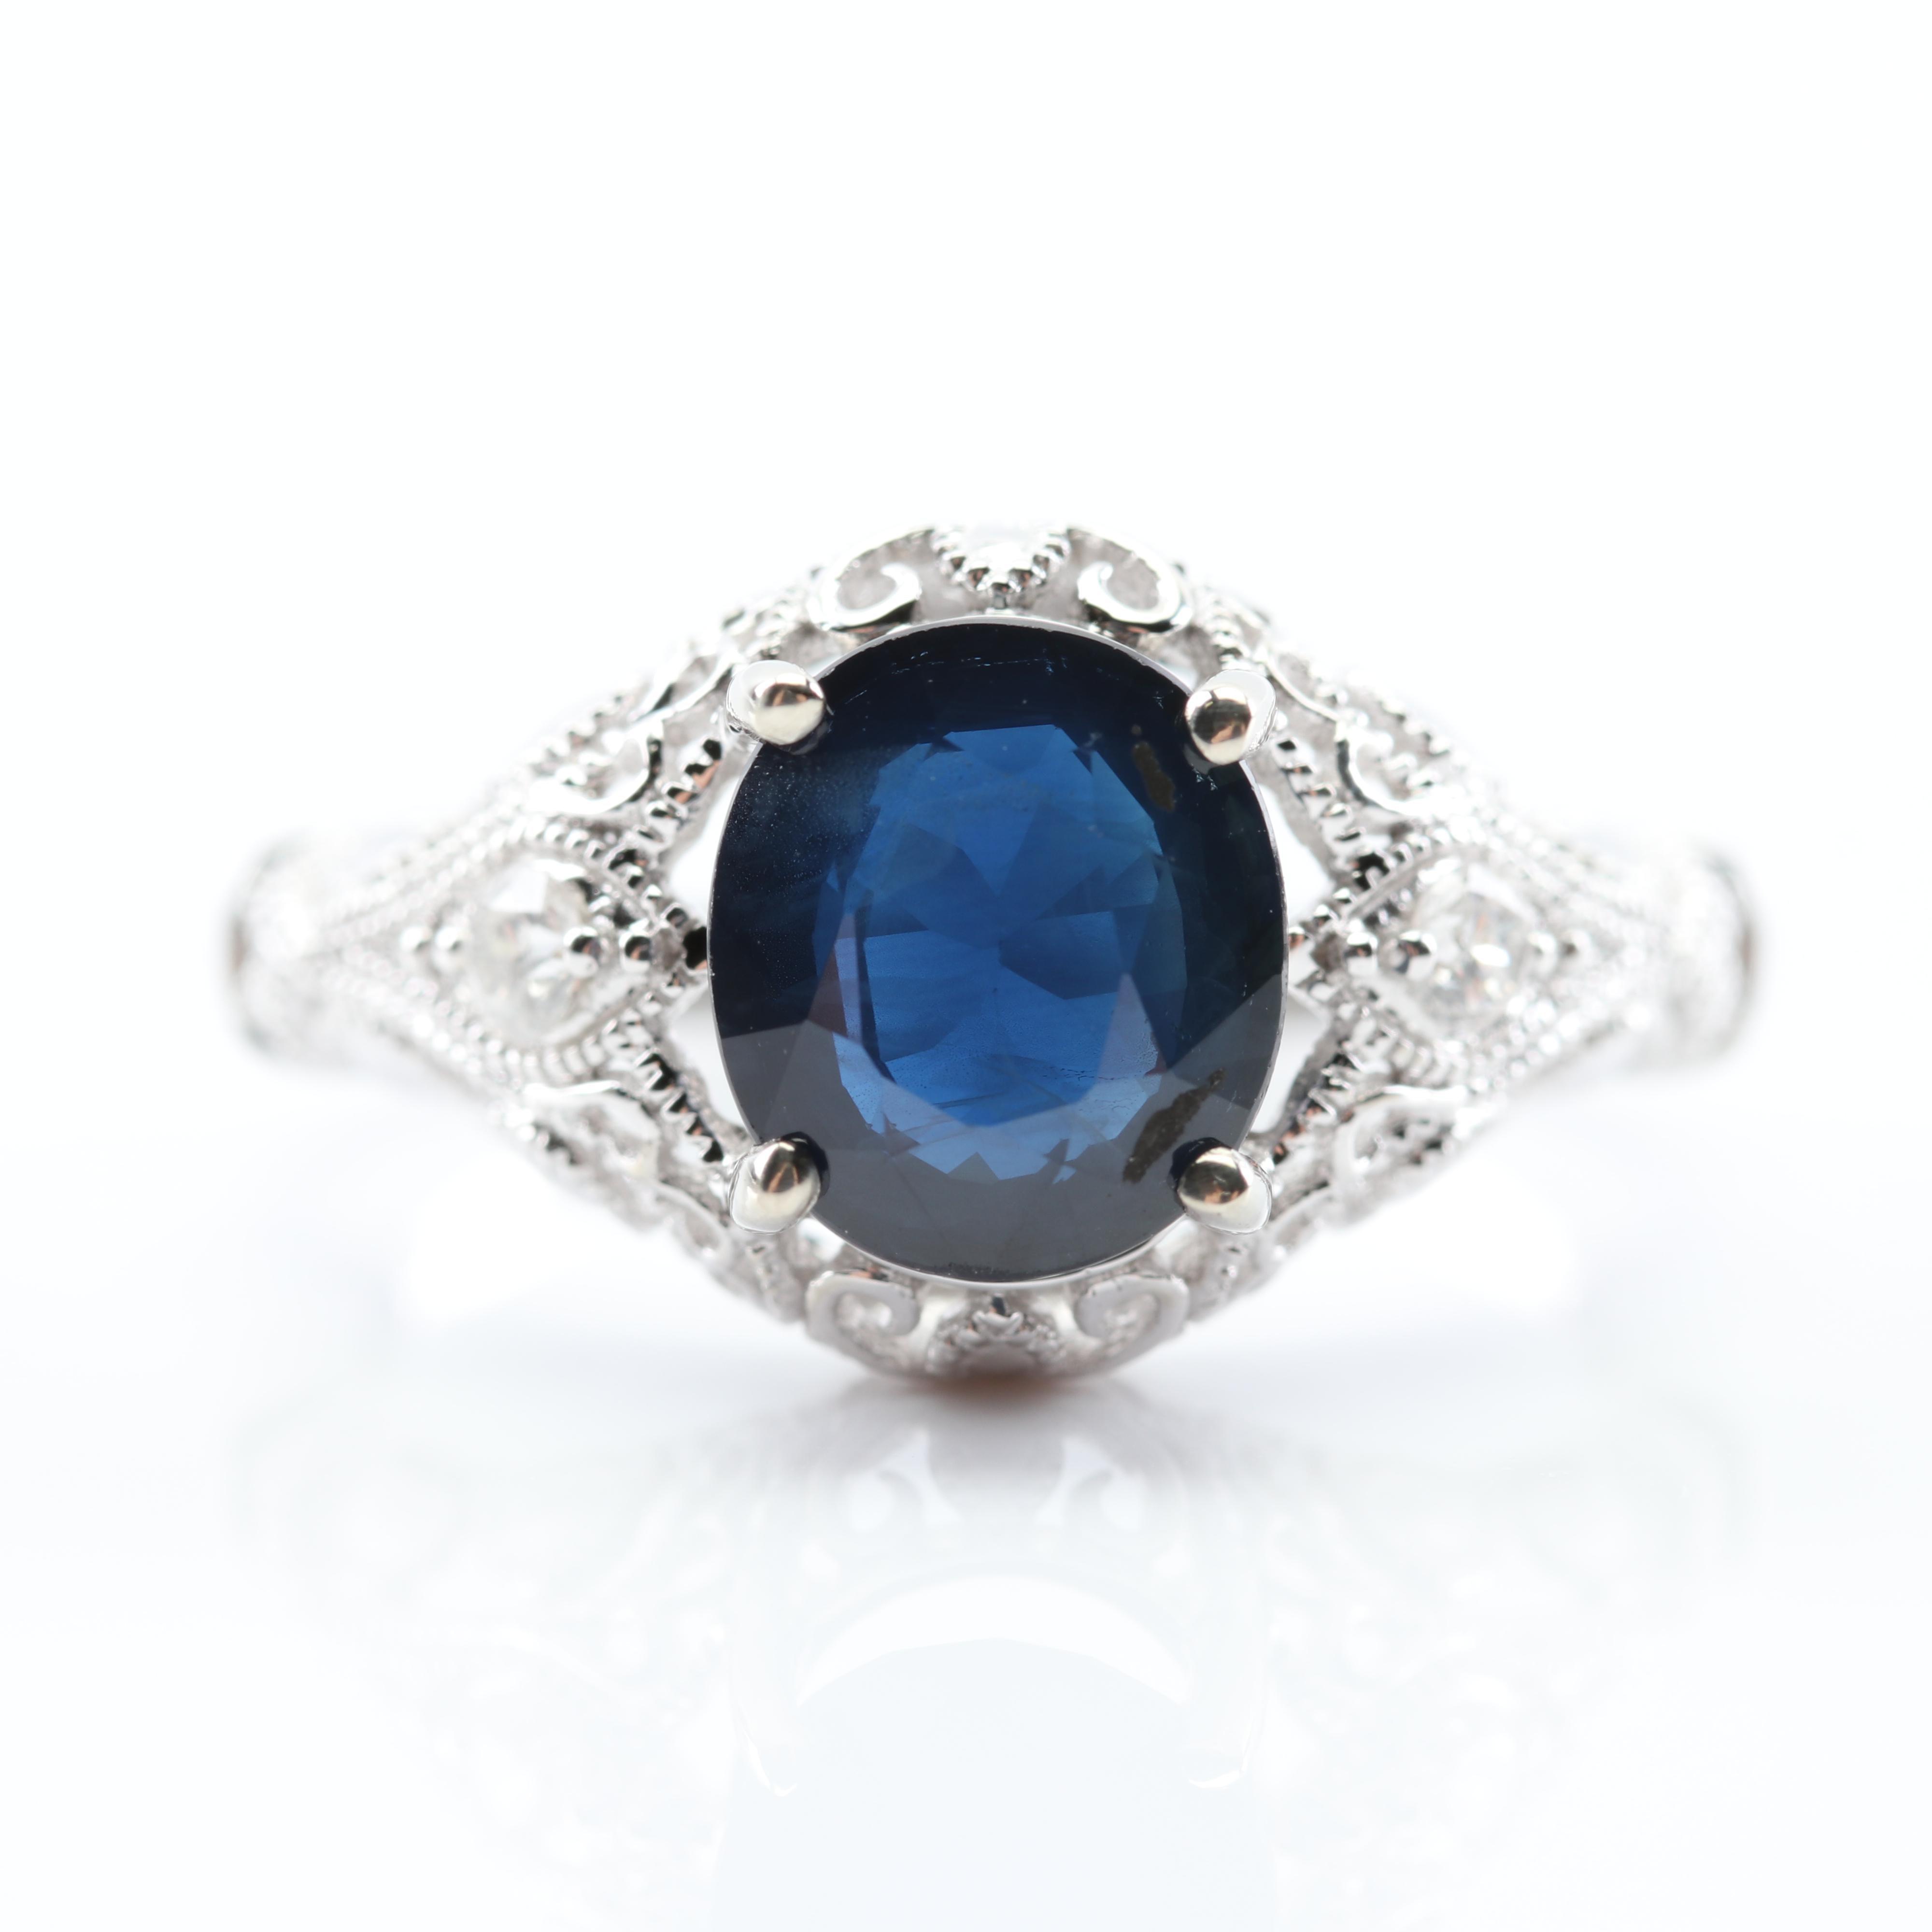 14K White Gold 2.52 CT Sapphire and Diamond Ring